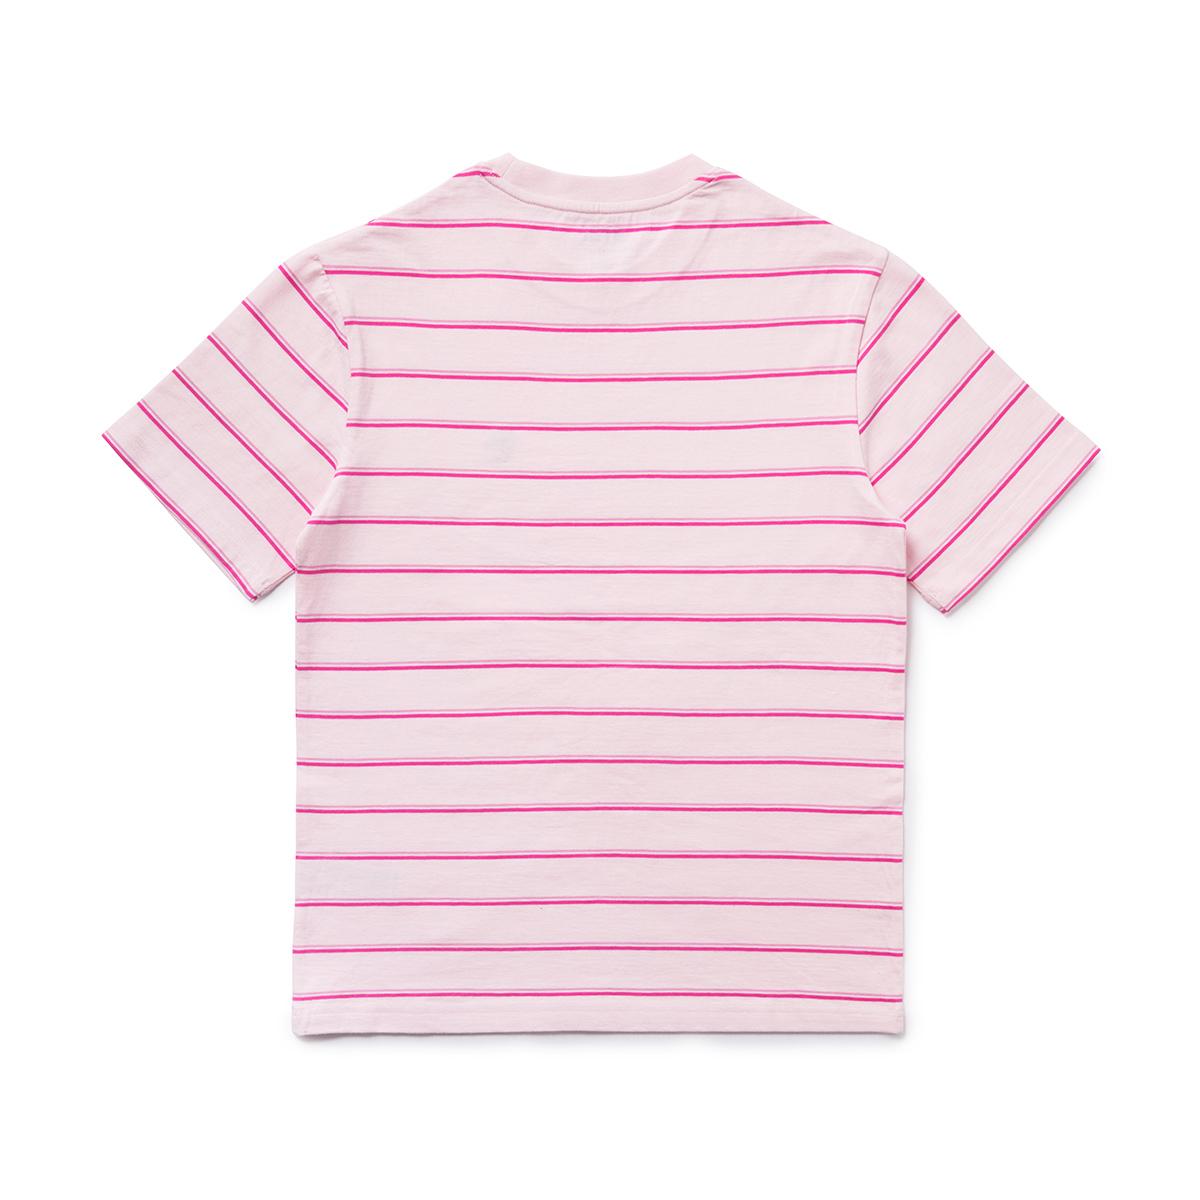 BT21 COOKY 베이직 스트라이프 반팔 티셔츠